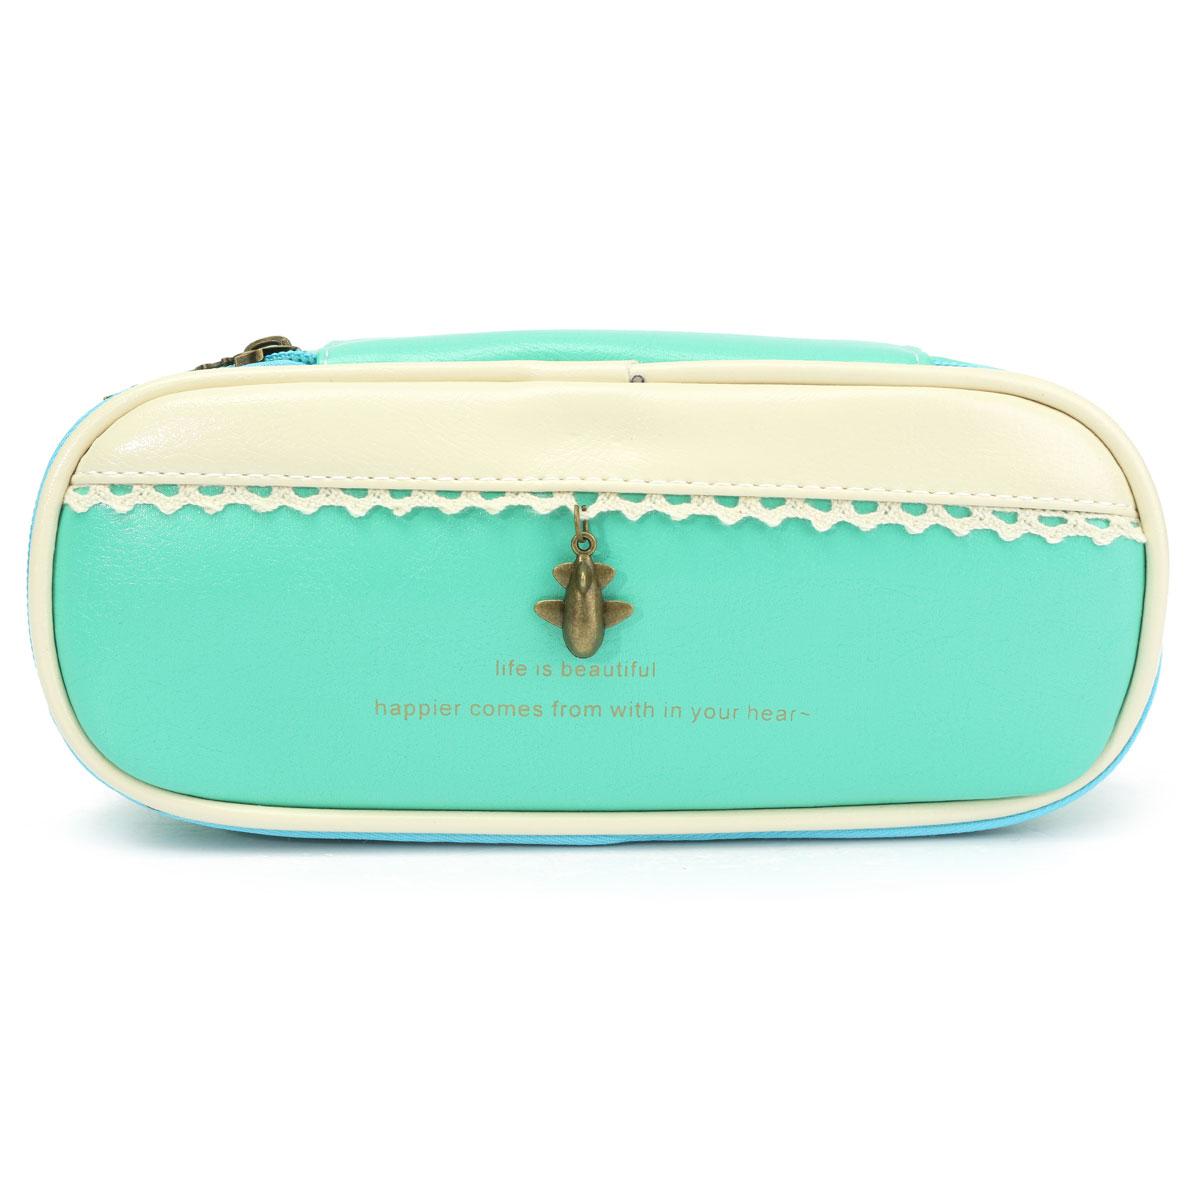 Pu Leather Cute Pen Bag Pencil Case Travel Cosmetic Makeup